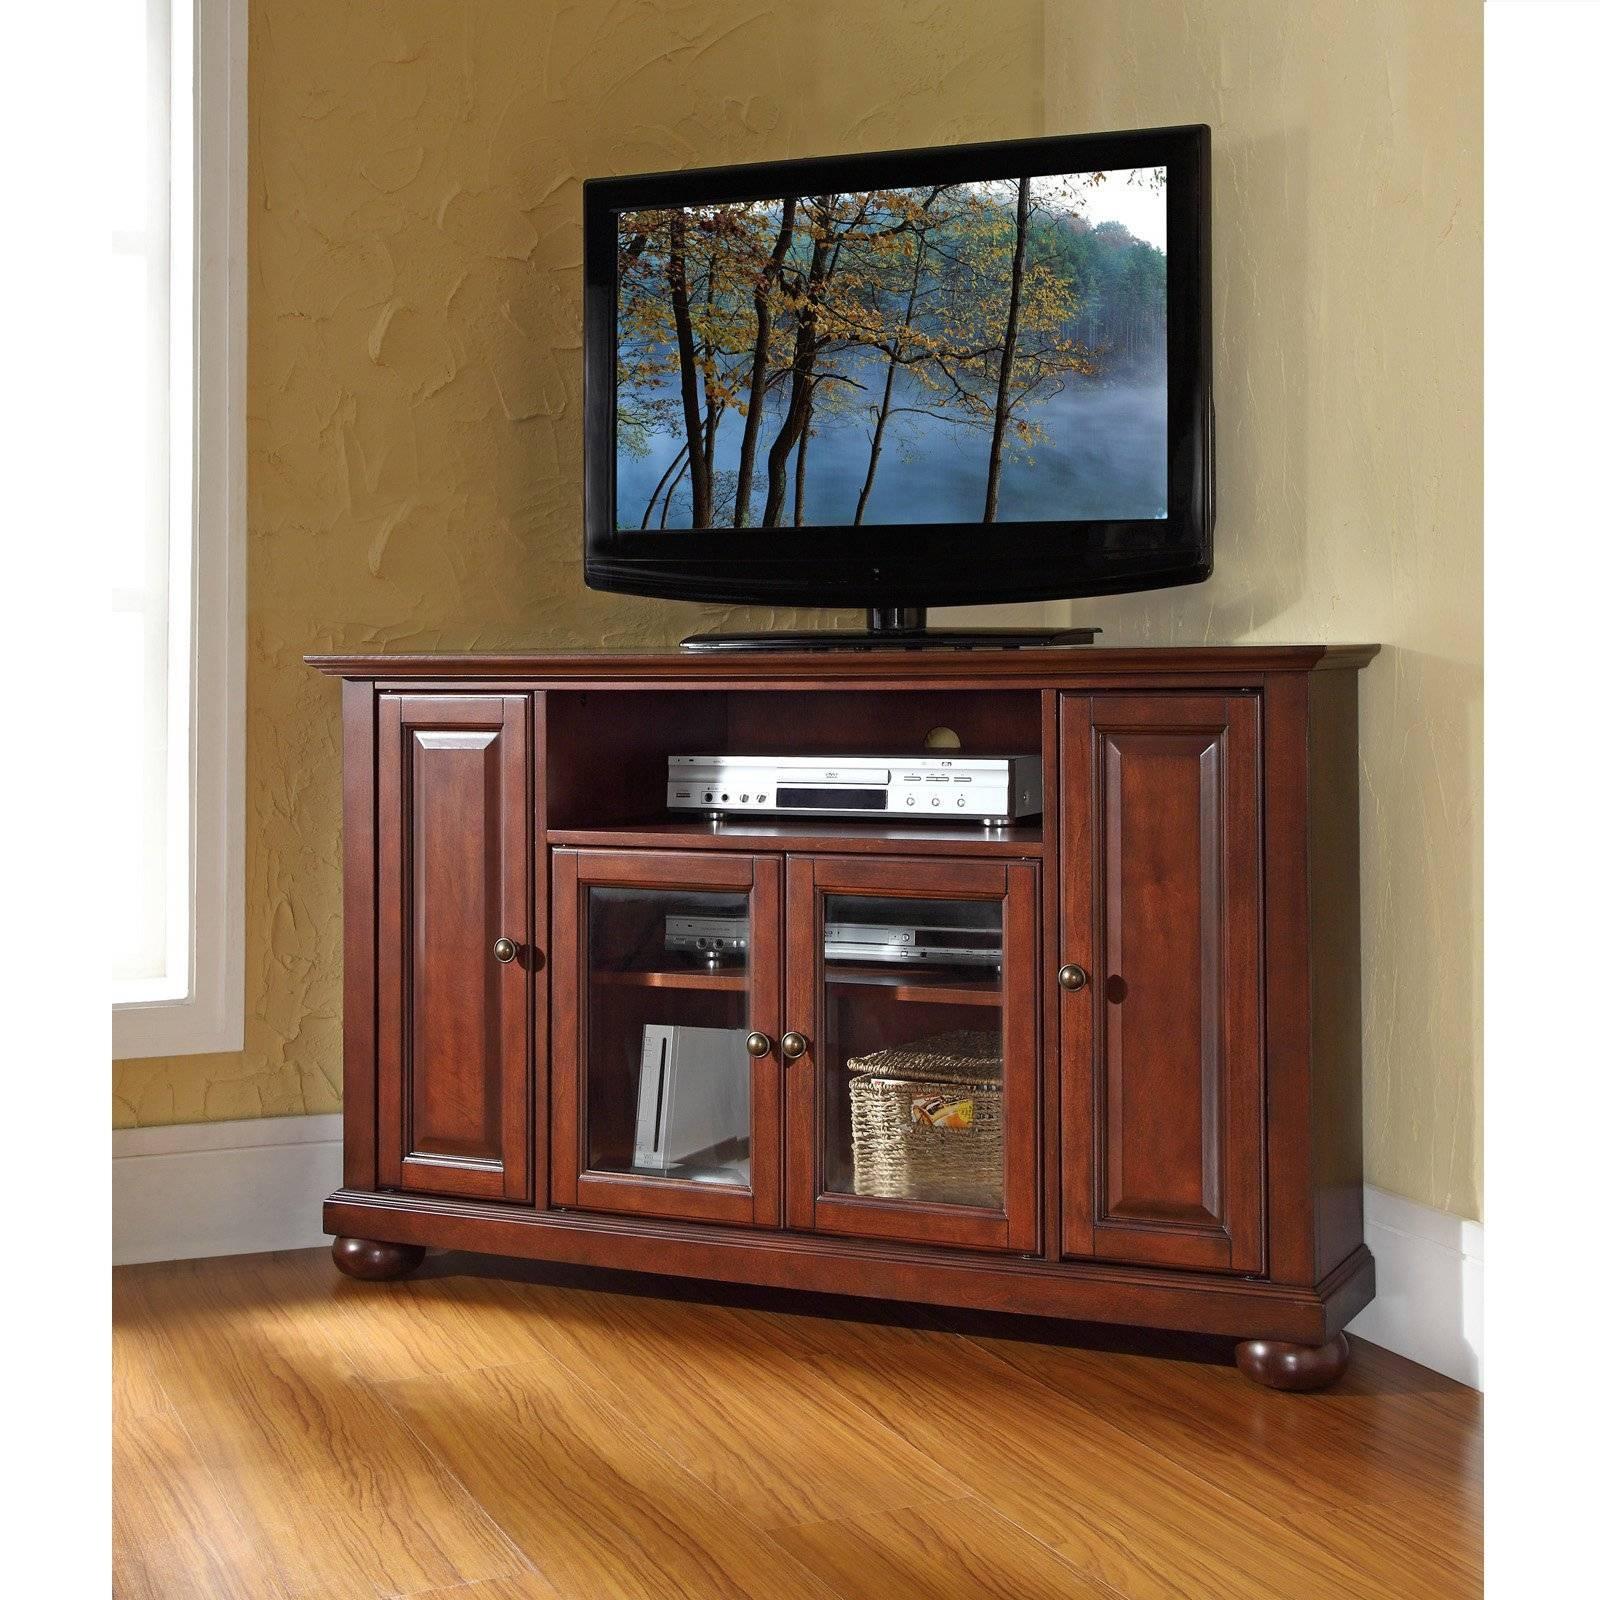 Crosley Alexandria 48 In. Corner Tv Stand - Vintage Mahogany for Mahogany Tv Cabinets (Image 6 of 15)